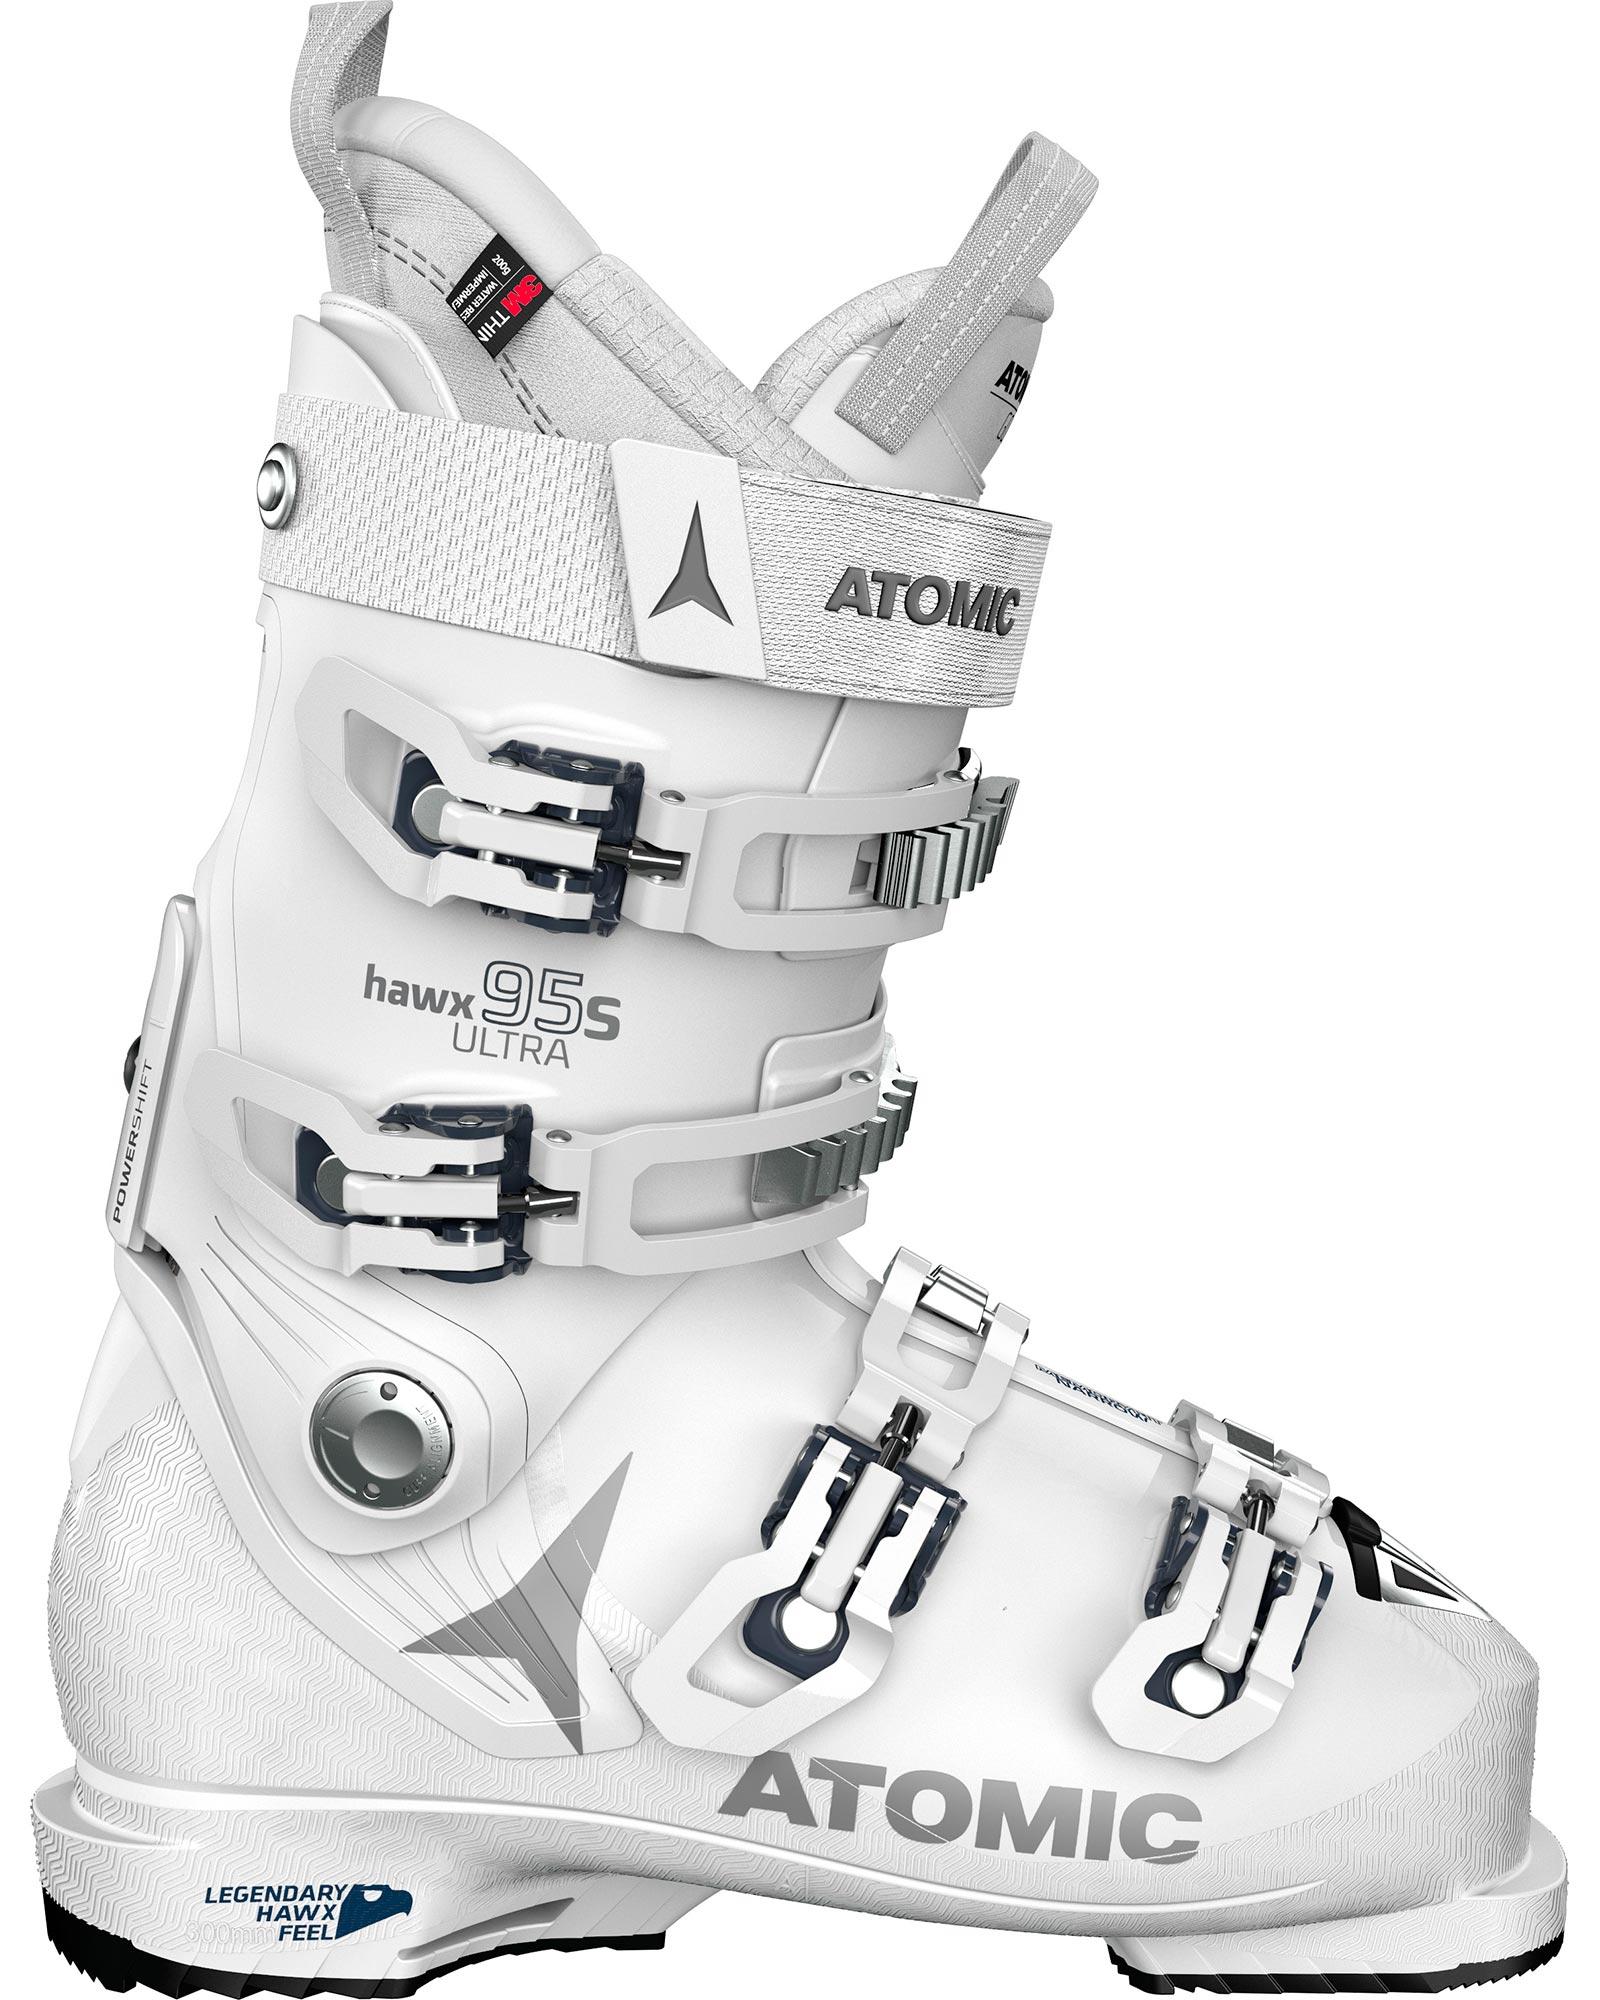 Atomic Women's Hawx Ultra 95 S W Ski Boots 2020 / 2021 0